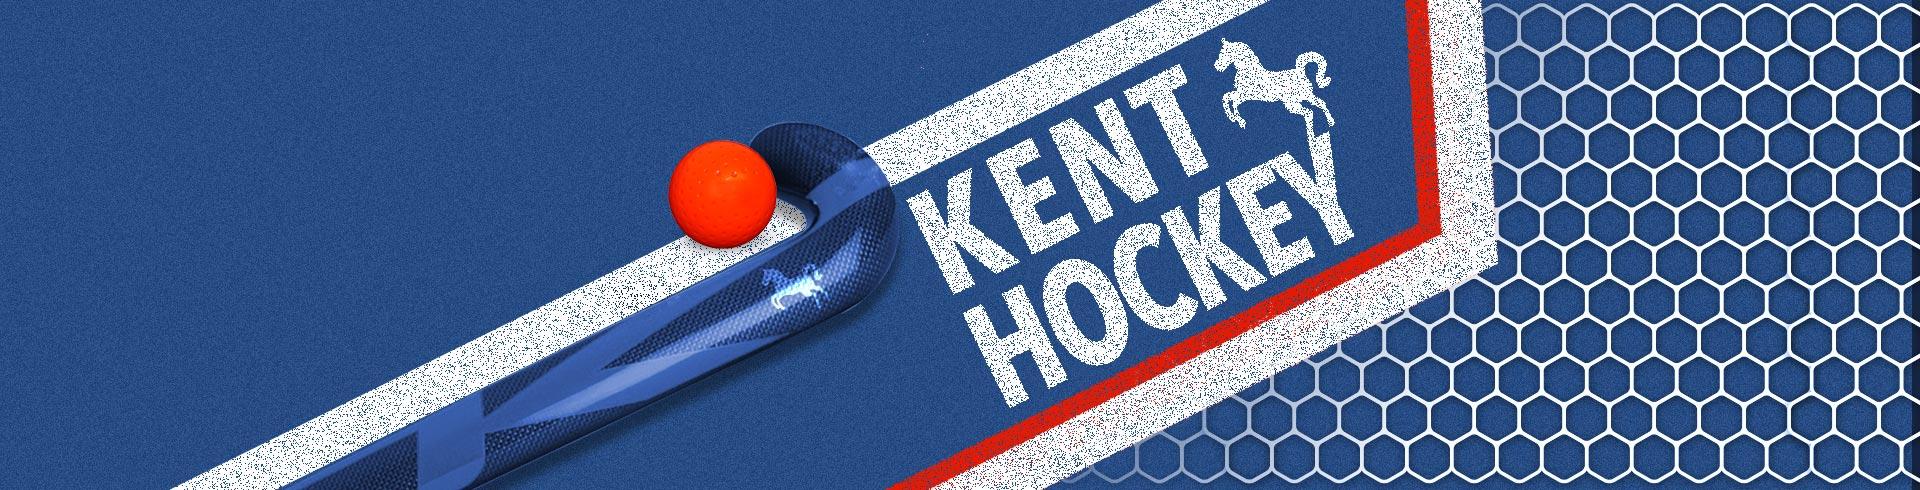 Kent Open Division 2 Kent Hockey Association